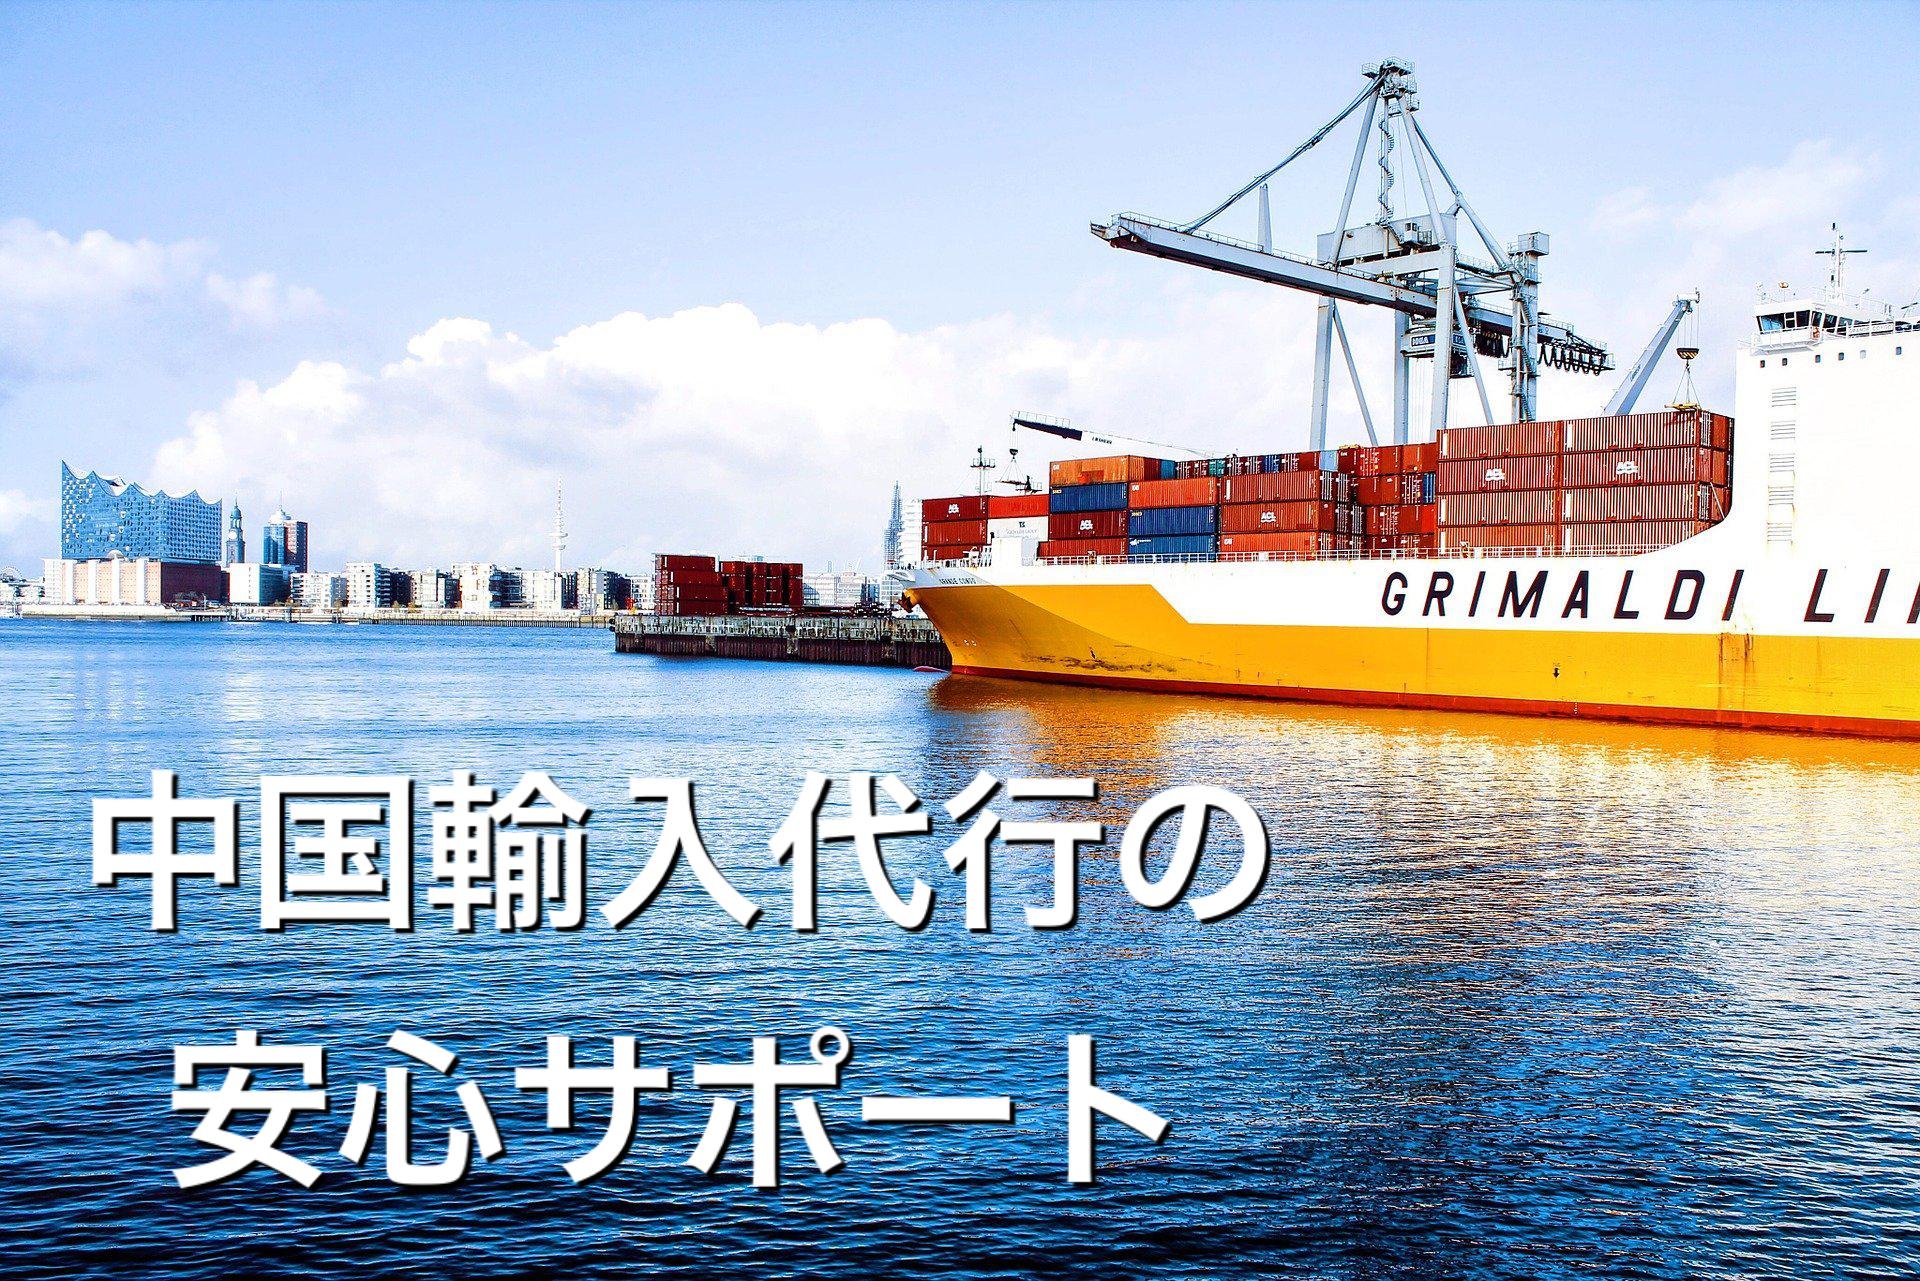 中国輸入代行 安心 サポート